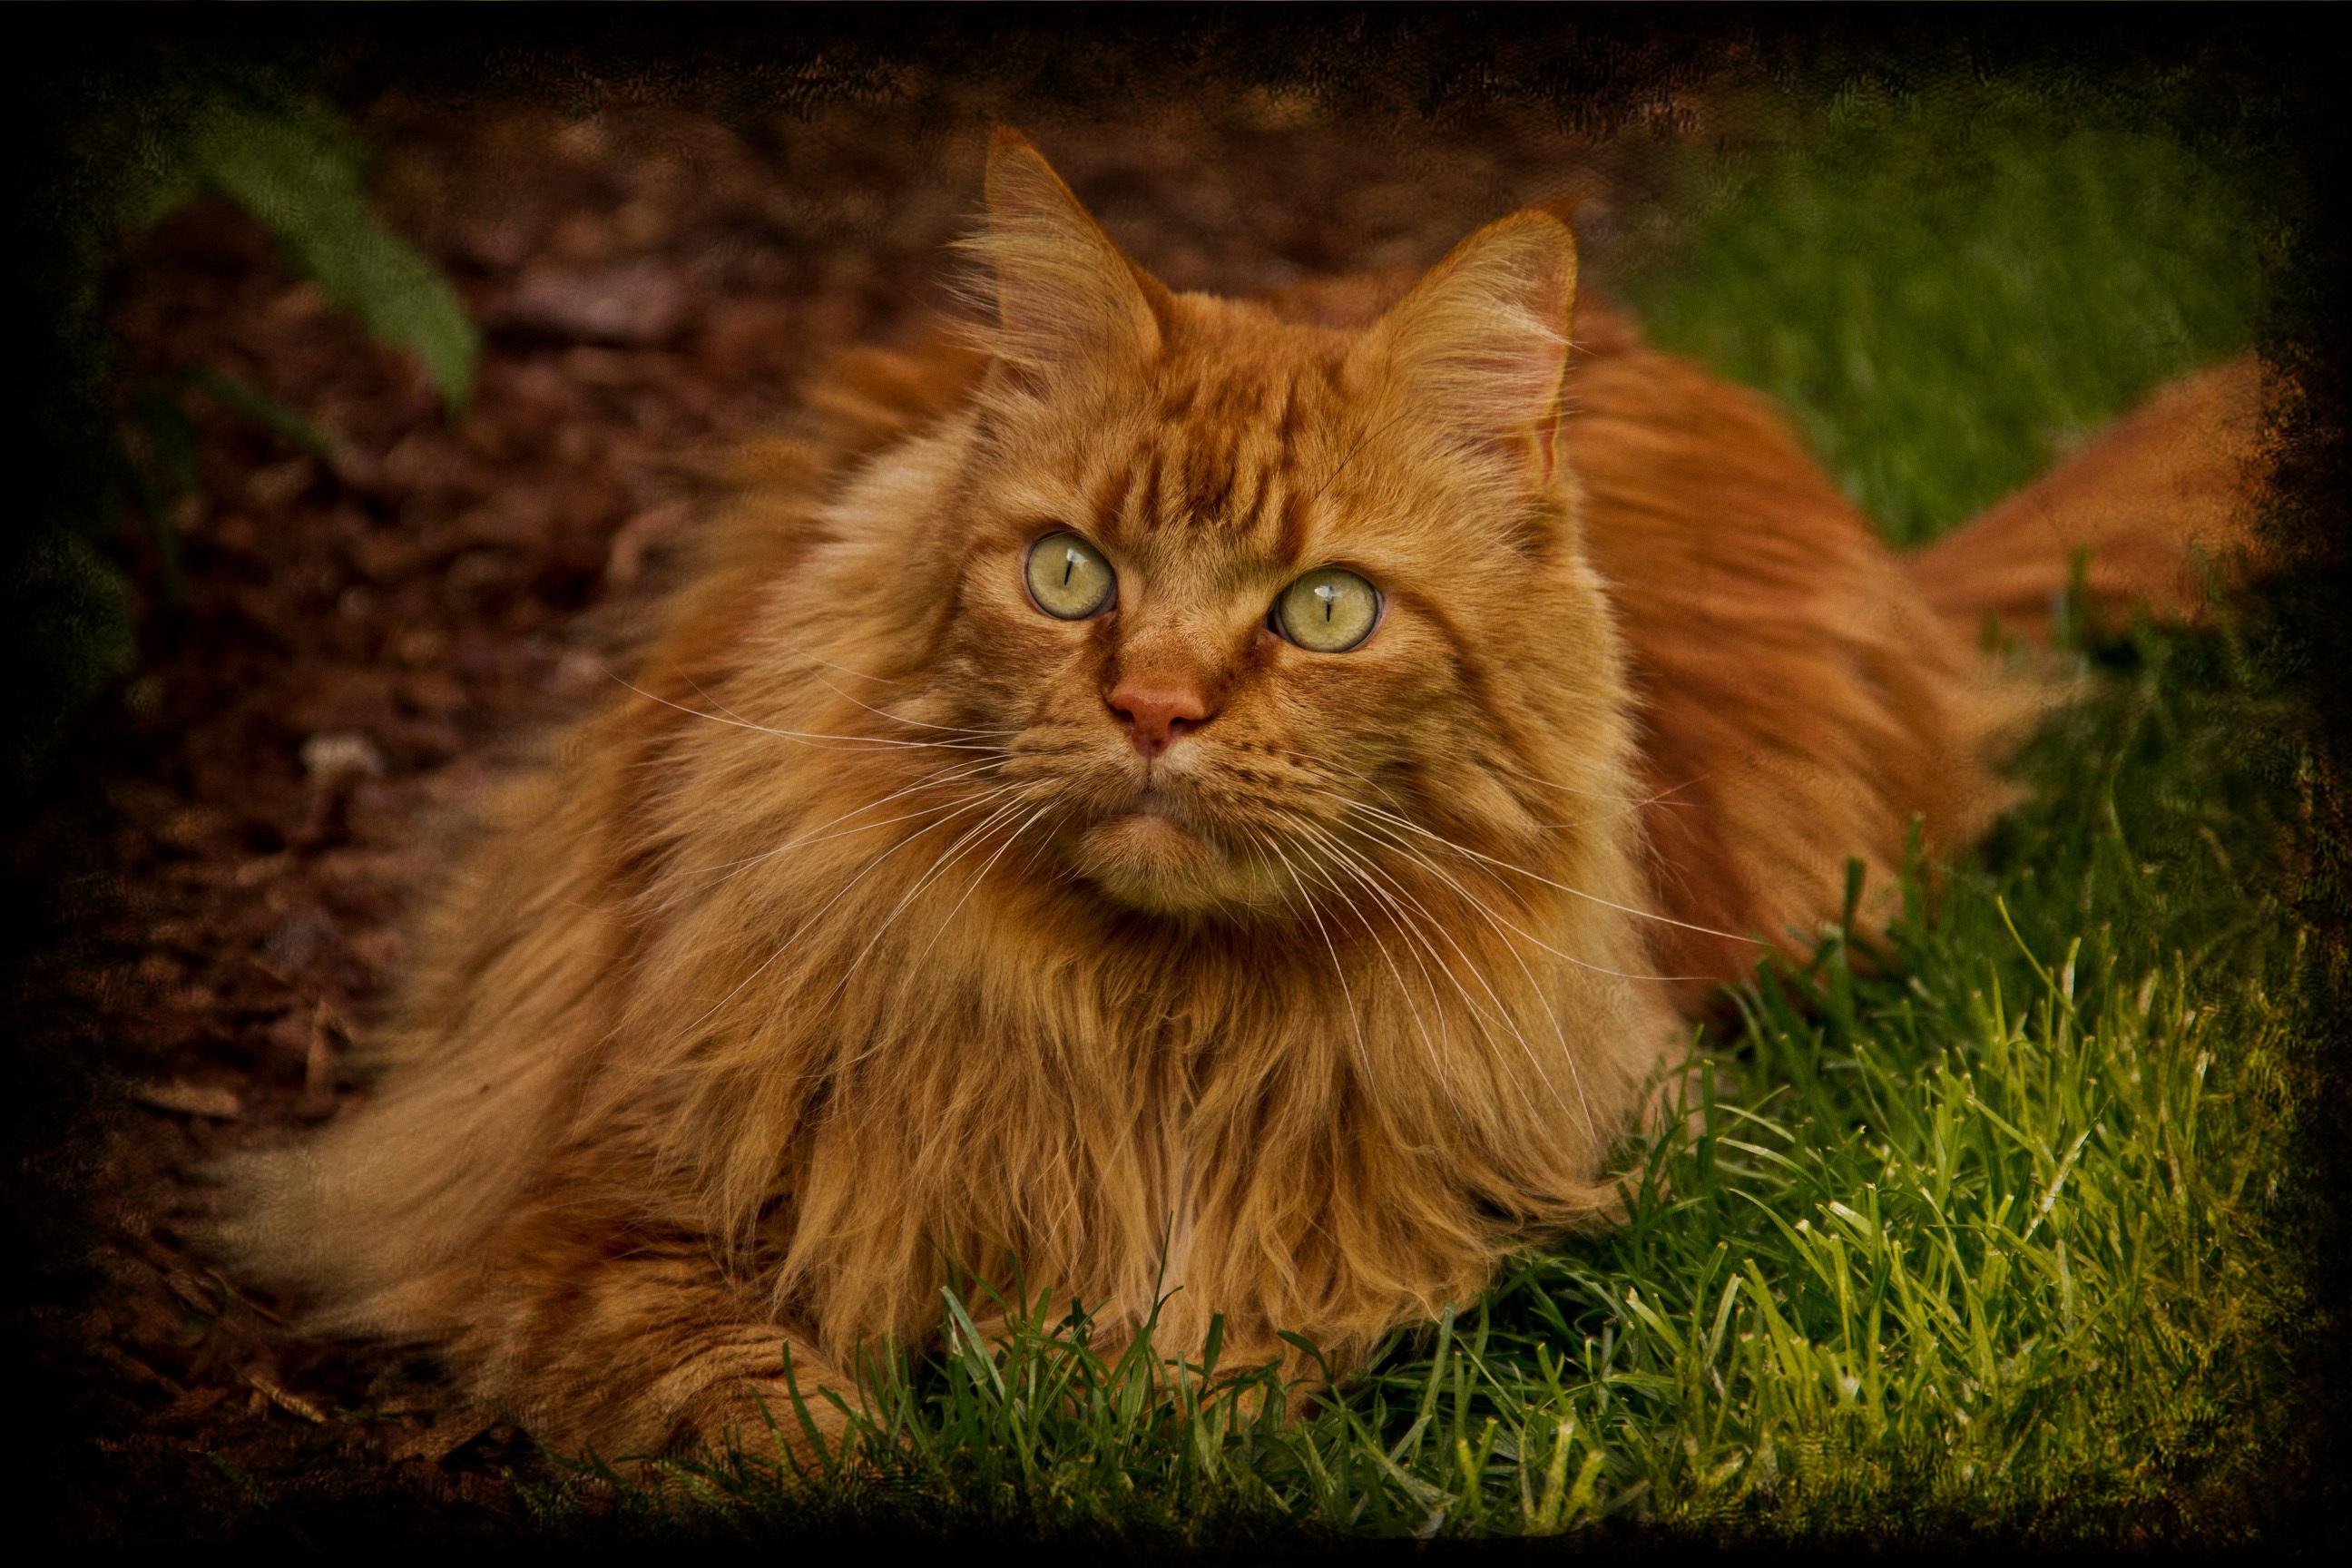 Cute Little Kitten Desktop Wallpapers 28 Beautiful Orange Maine Coon Cat Pictures And Photos